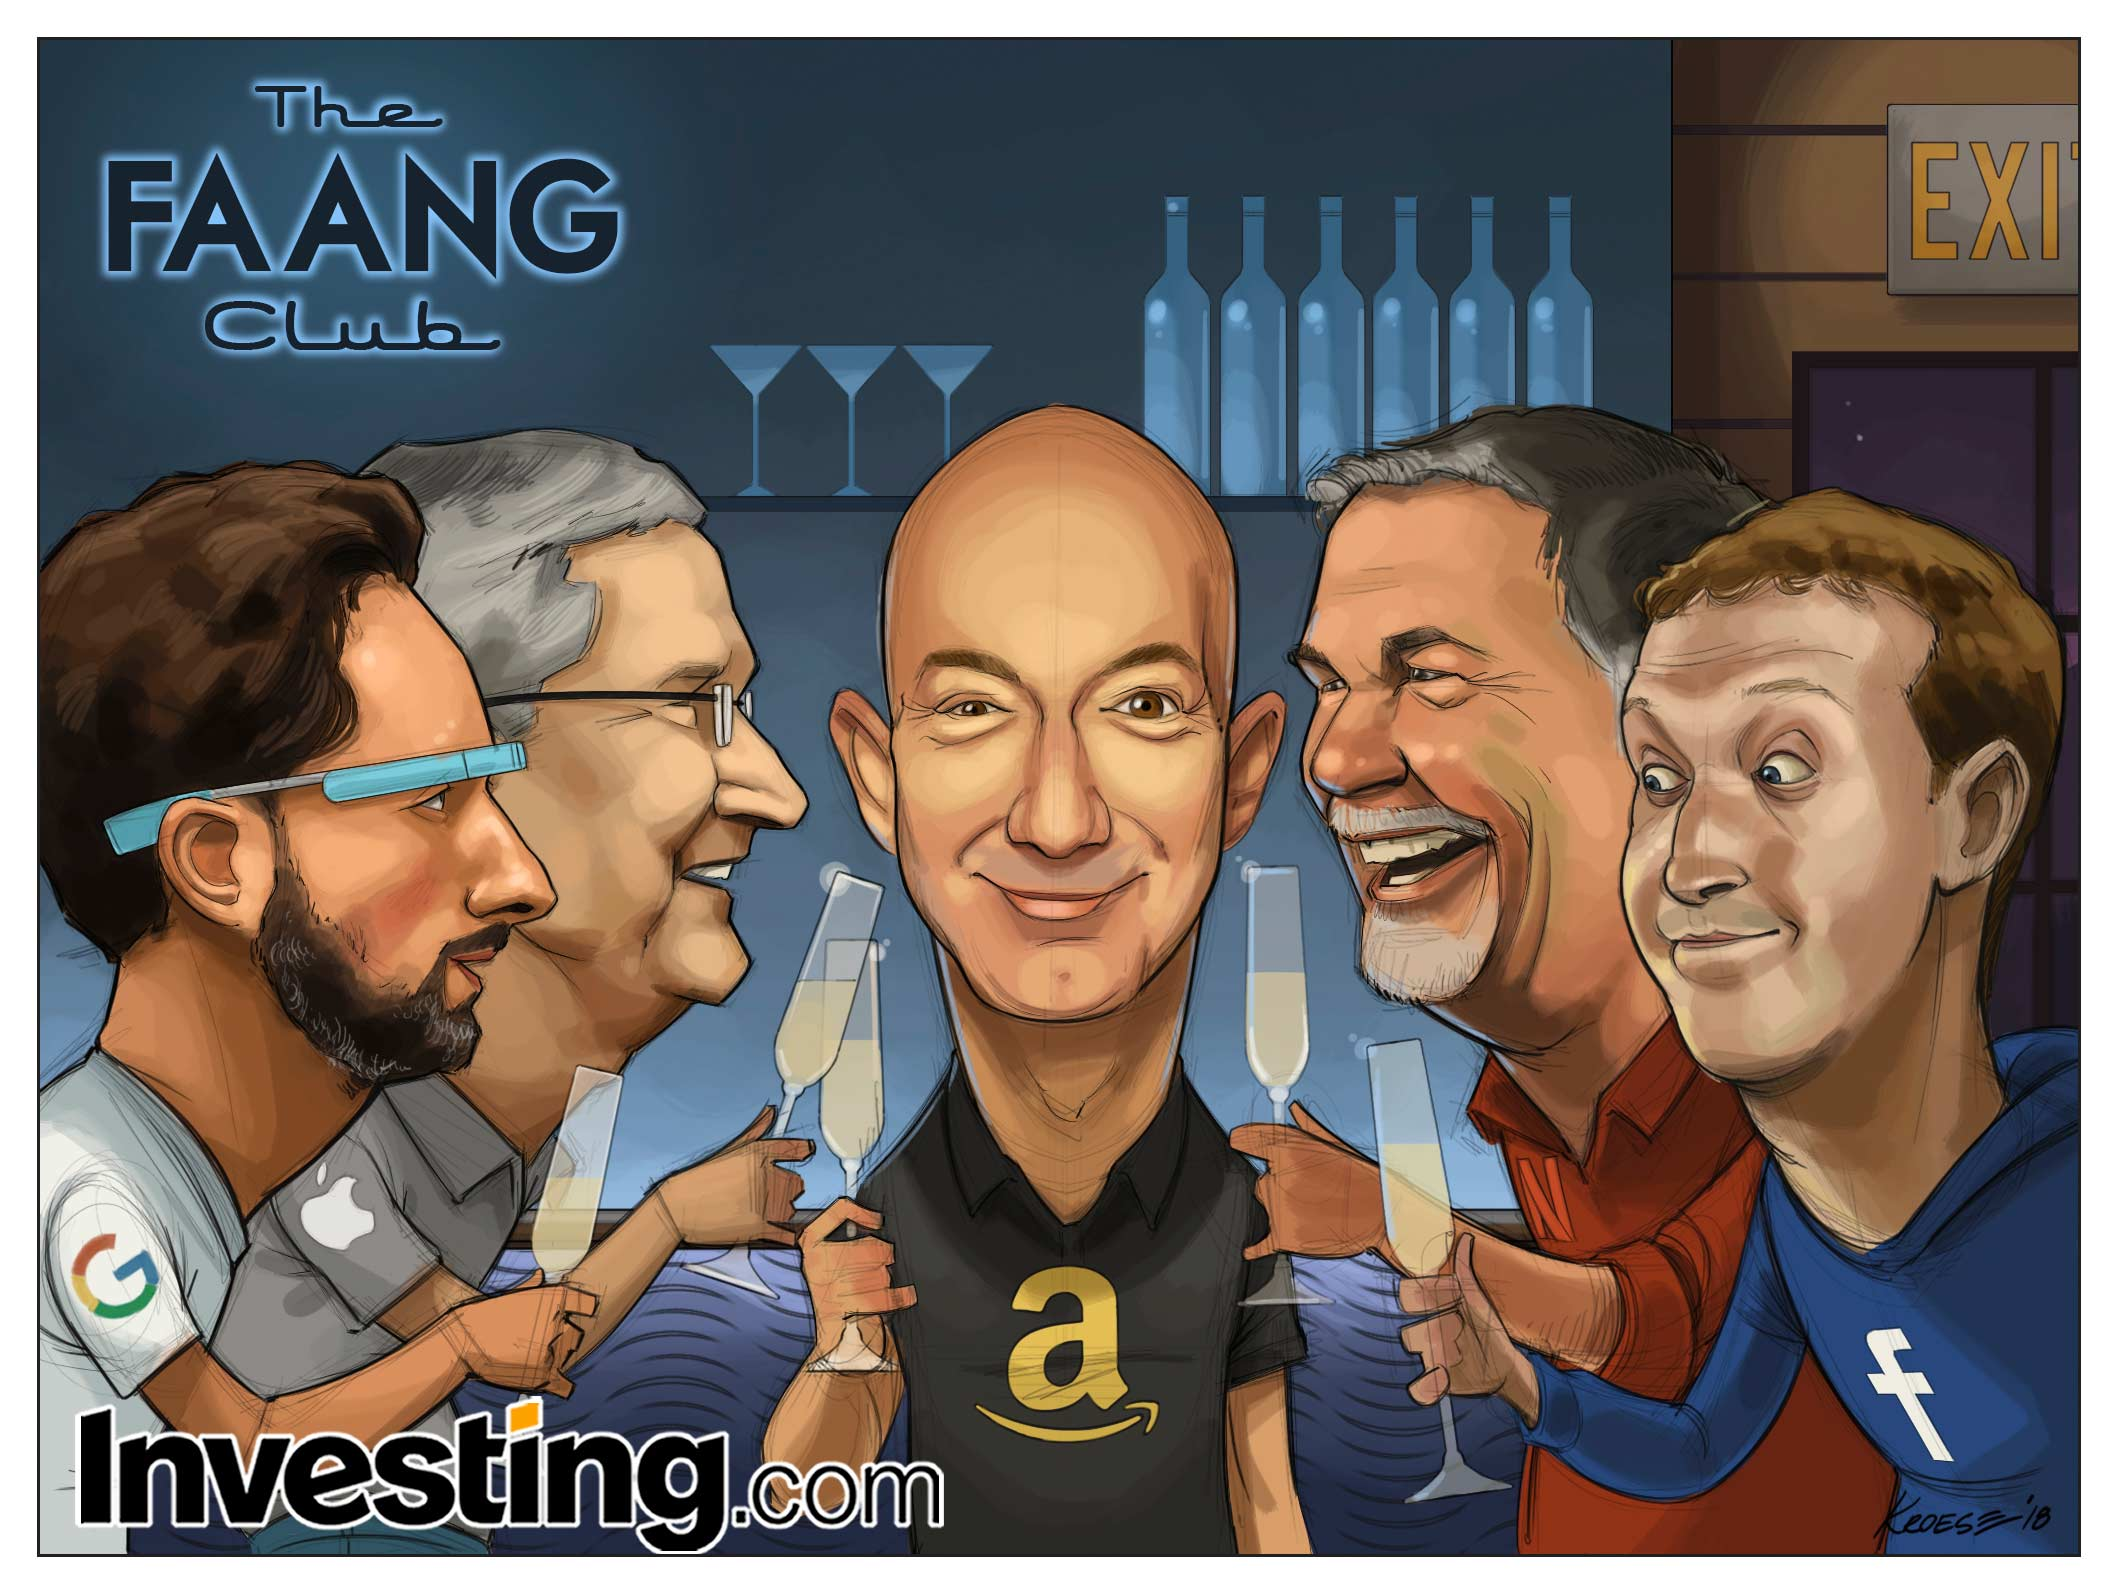 FAANG株は引き続き株式市場の上昇をリードする